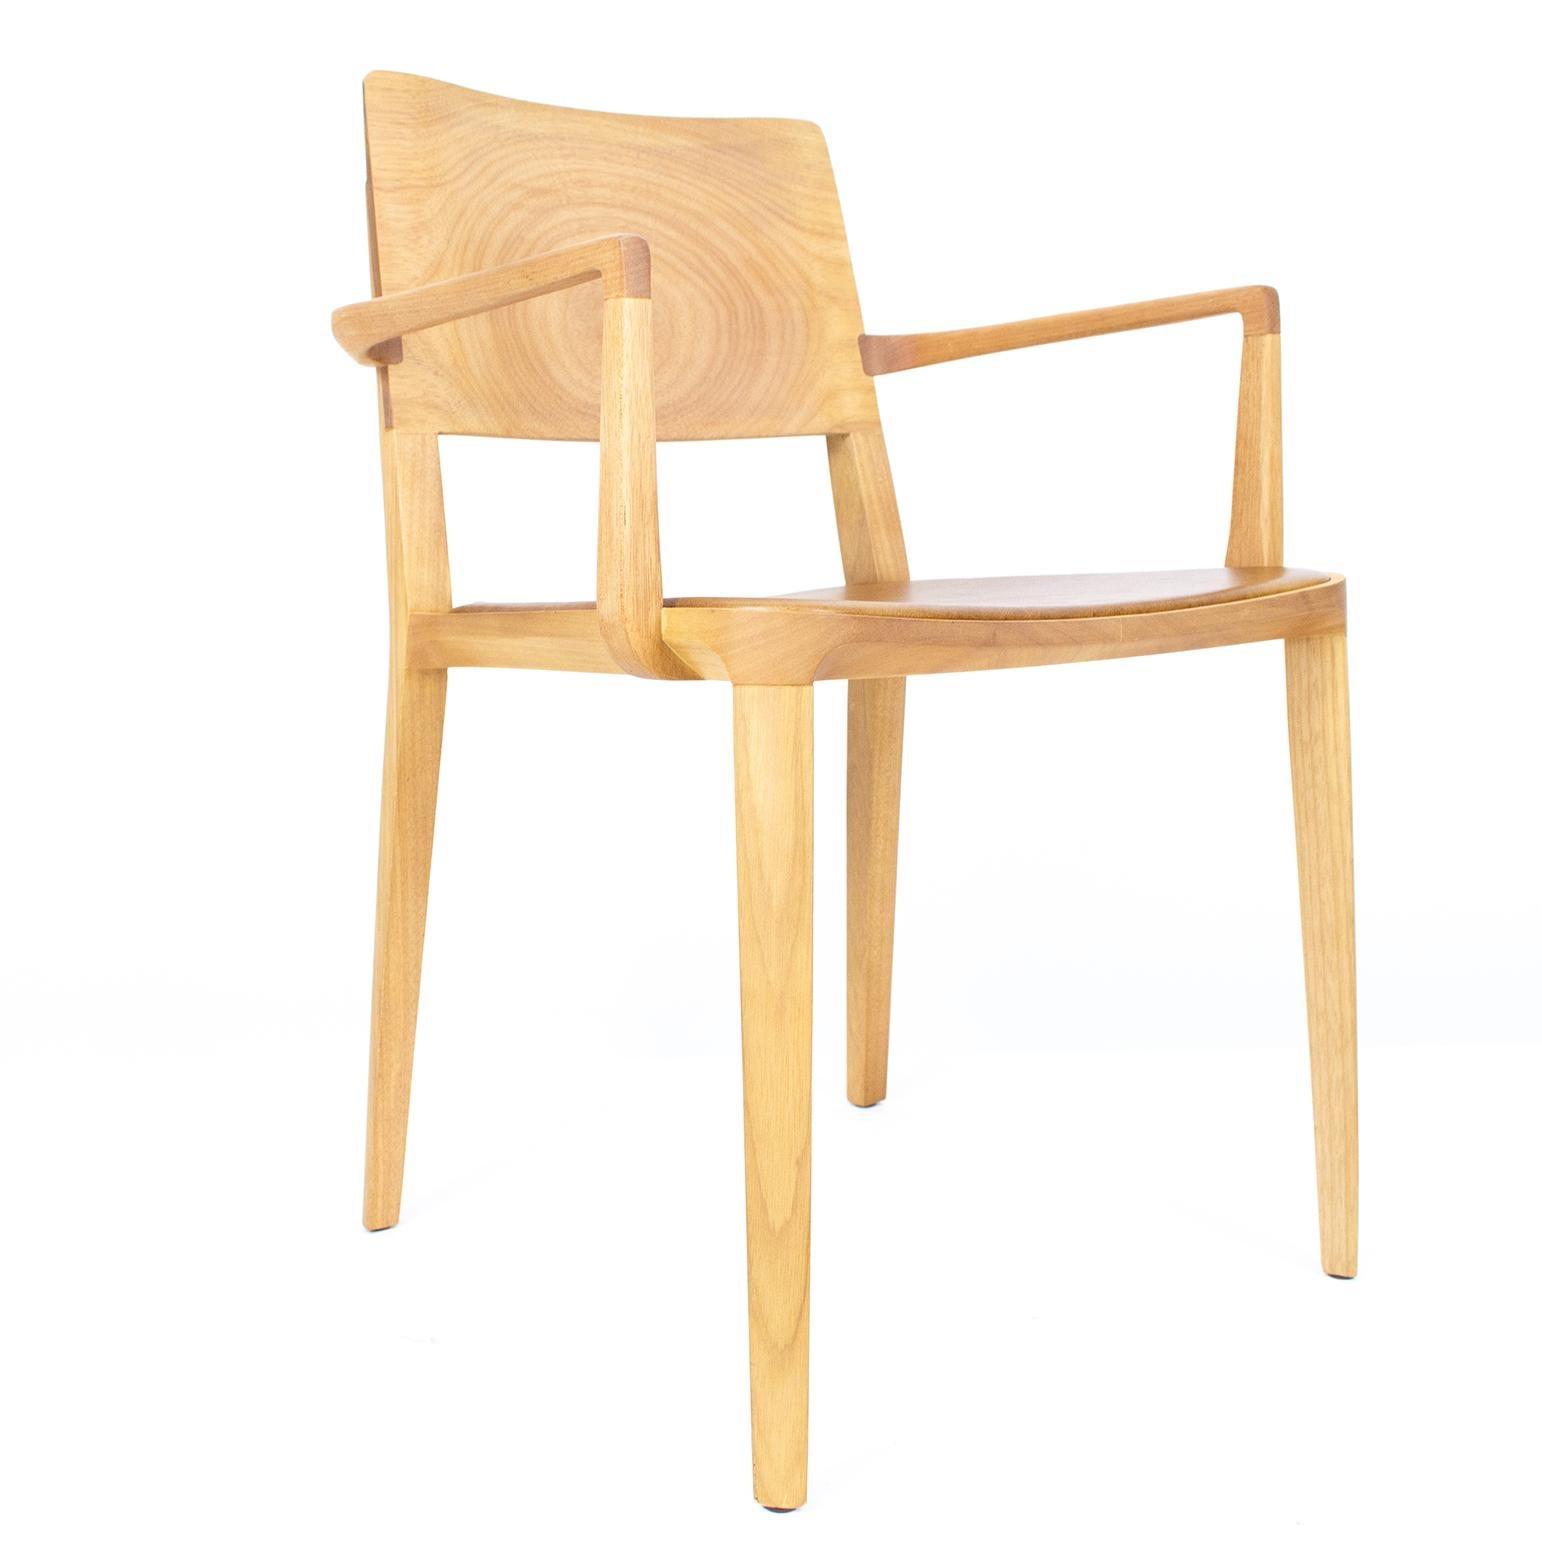 Minimalist Armchair in Hardwood